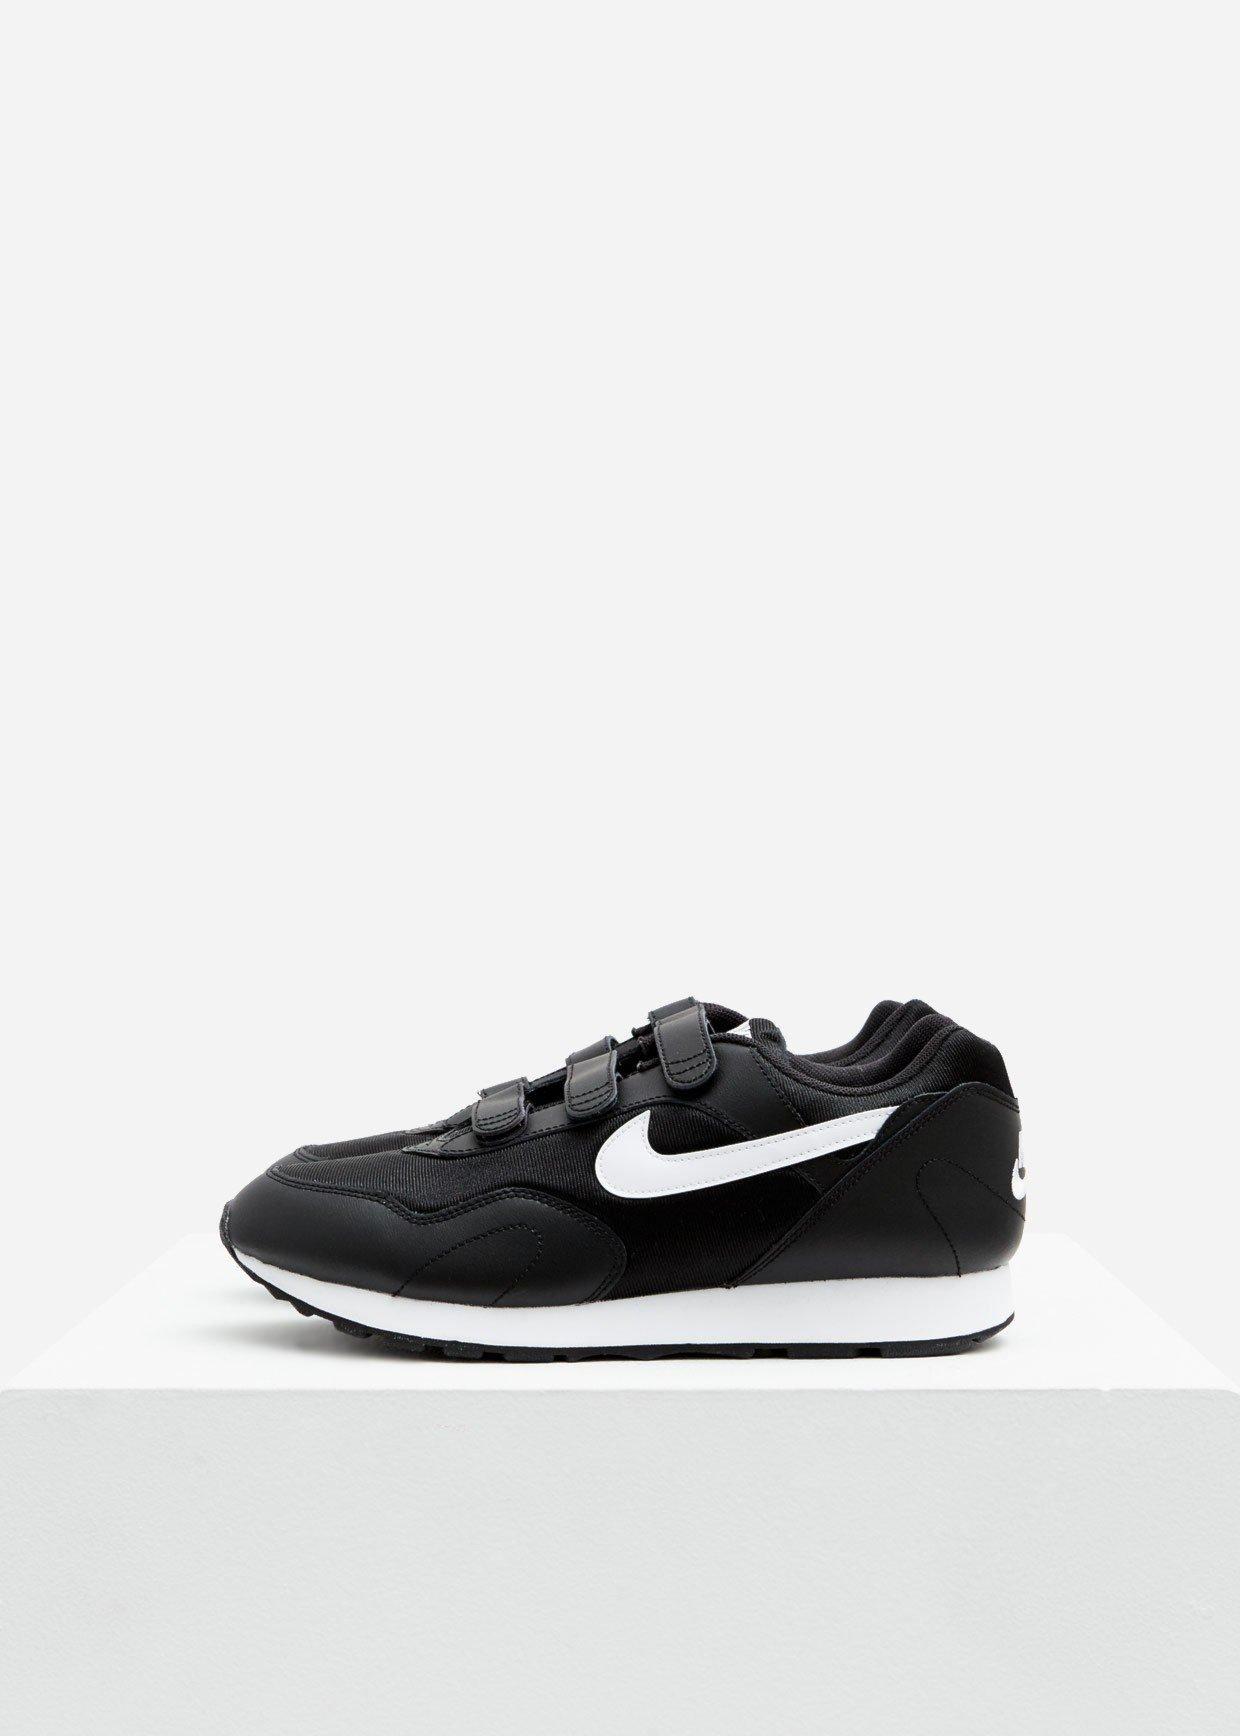 Nike Leather Outburst V in Black